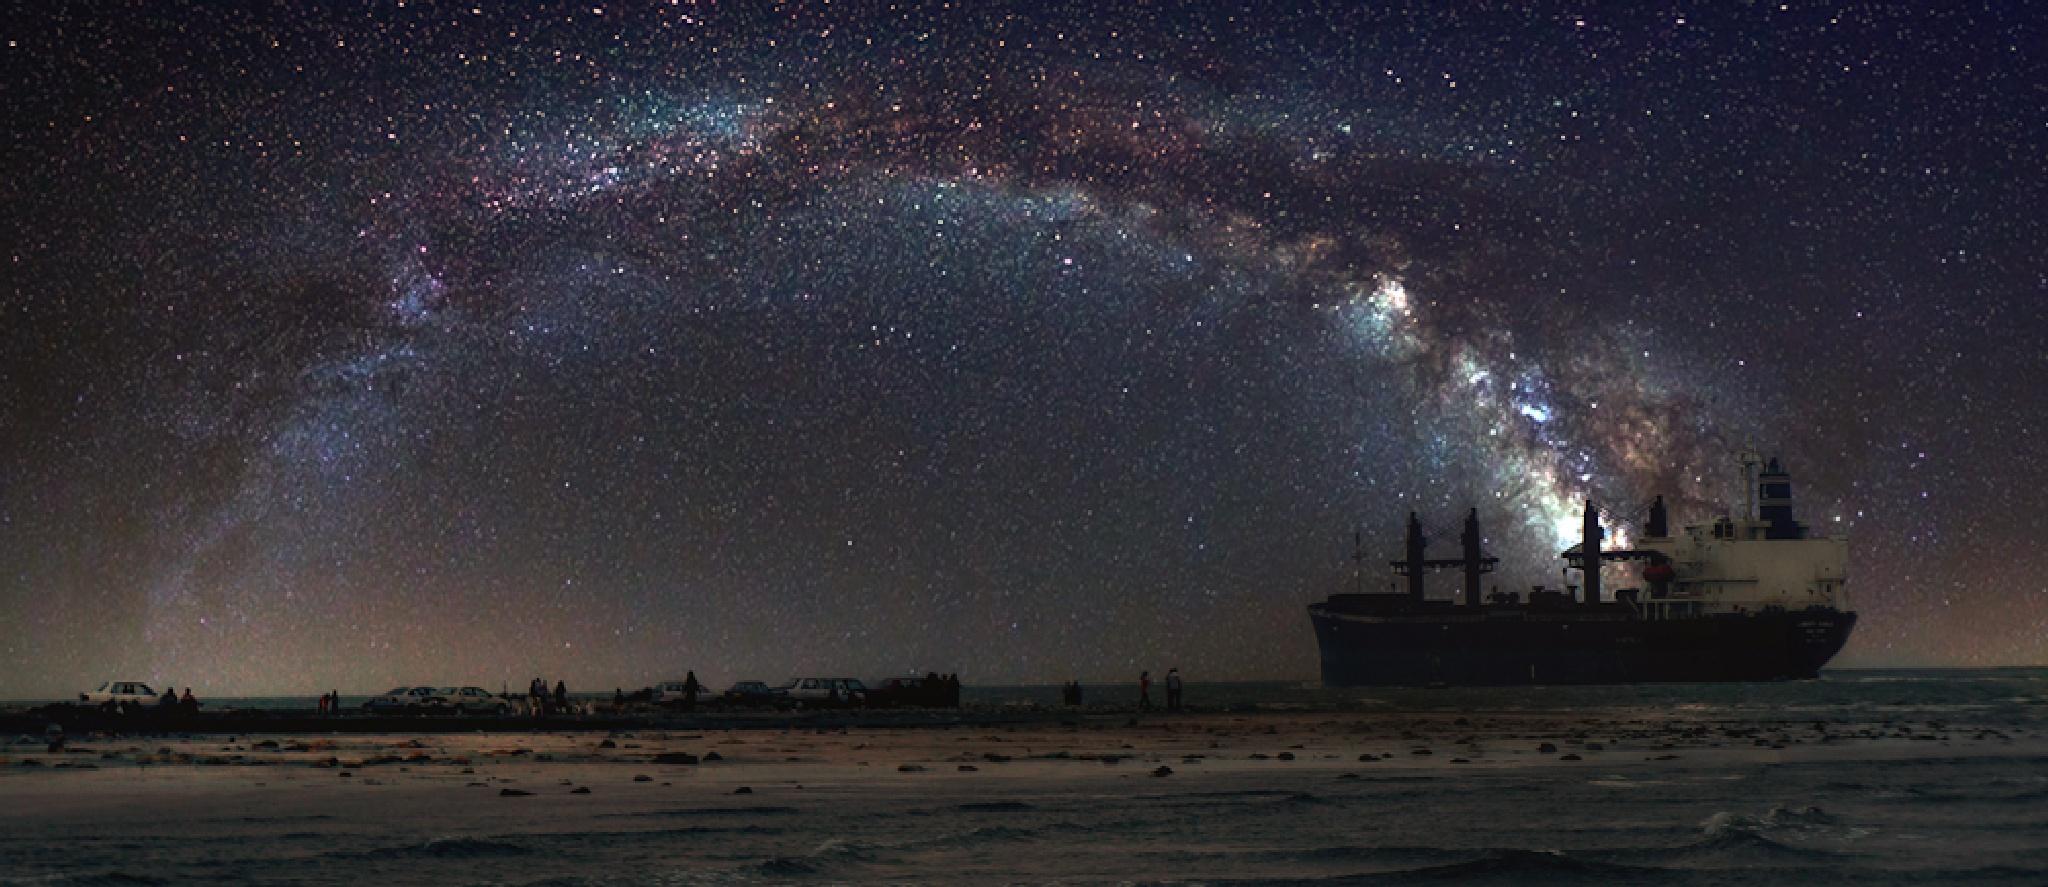 ~Magical Nights~ by AdamscreationS